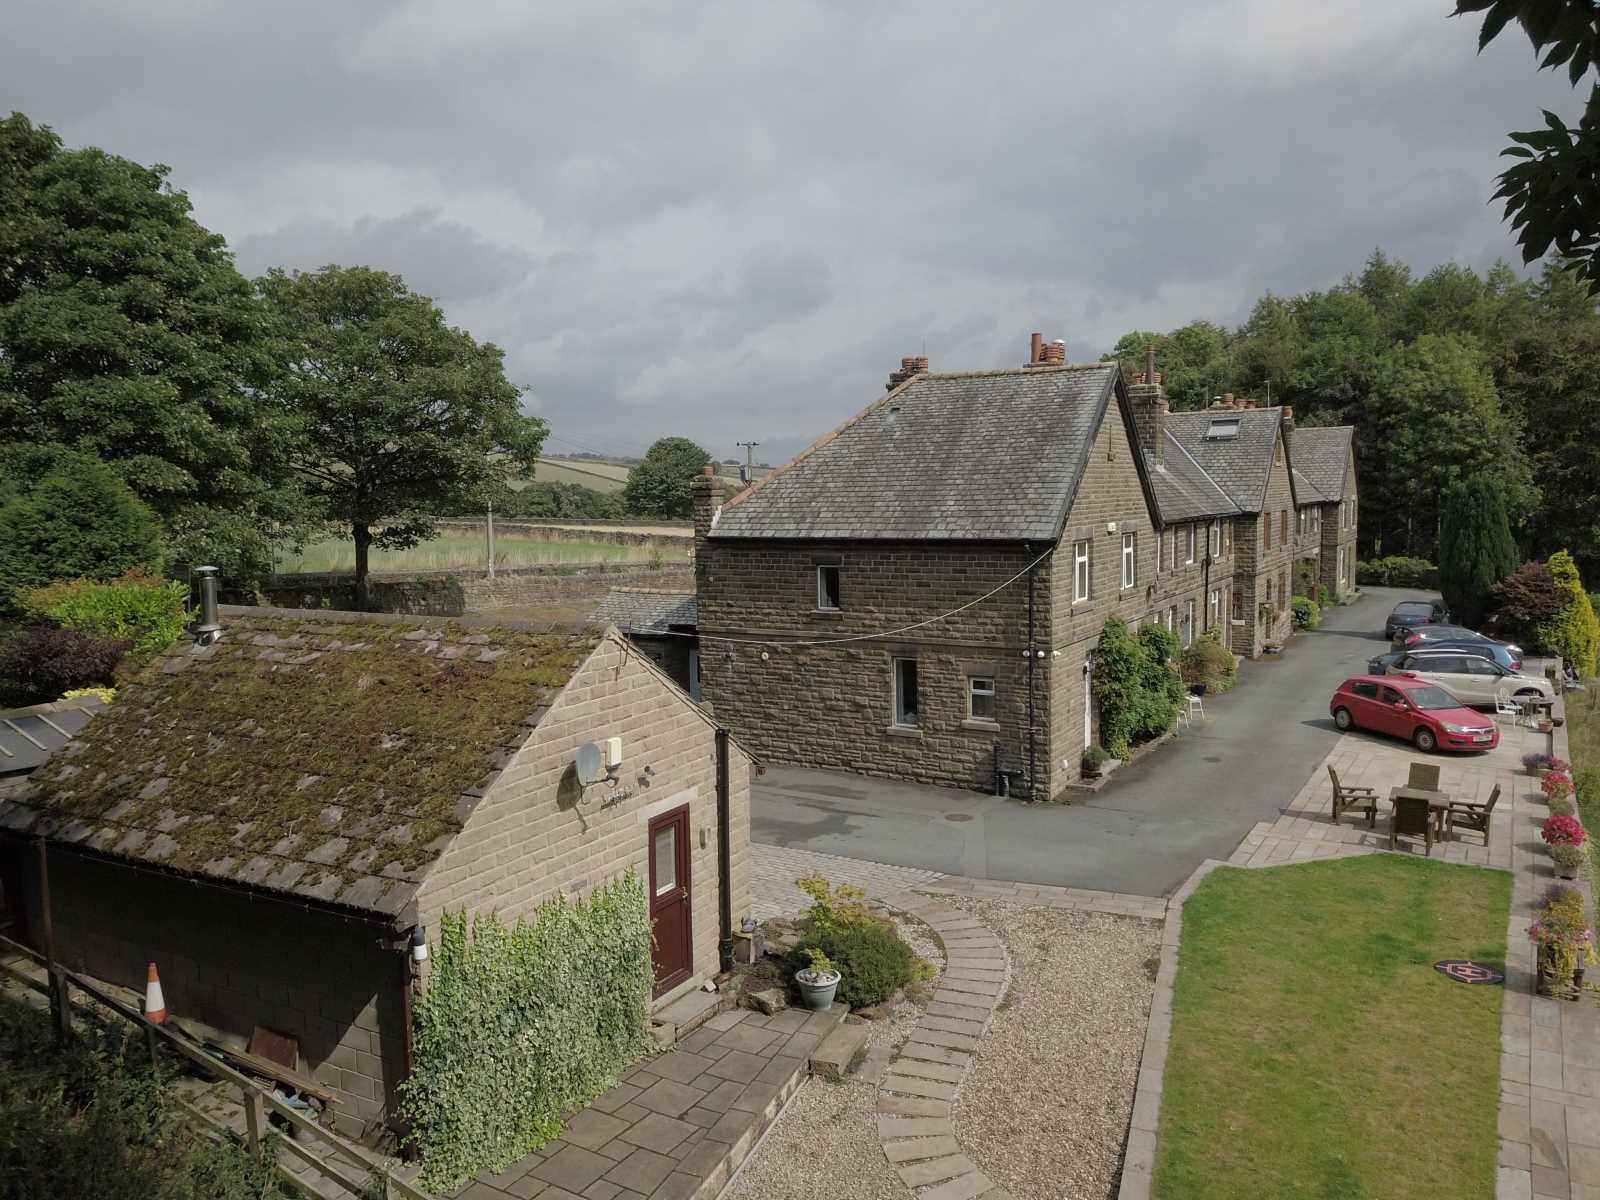 1 Wheat Close, Holmbridge, Holmfirth, HD9 2QL